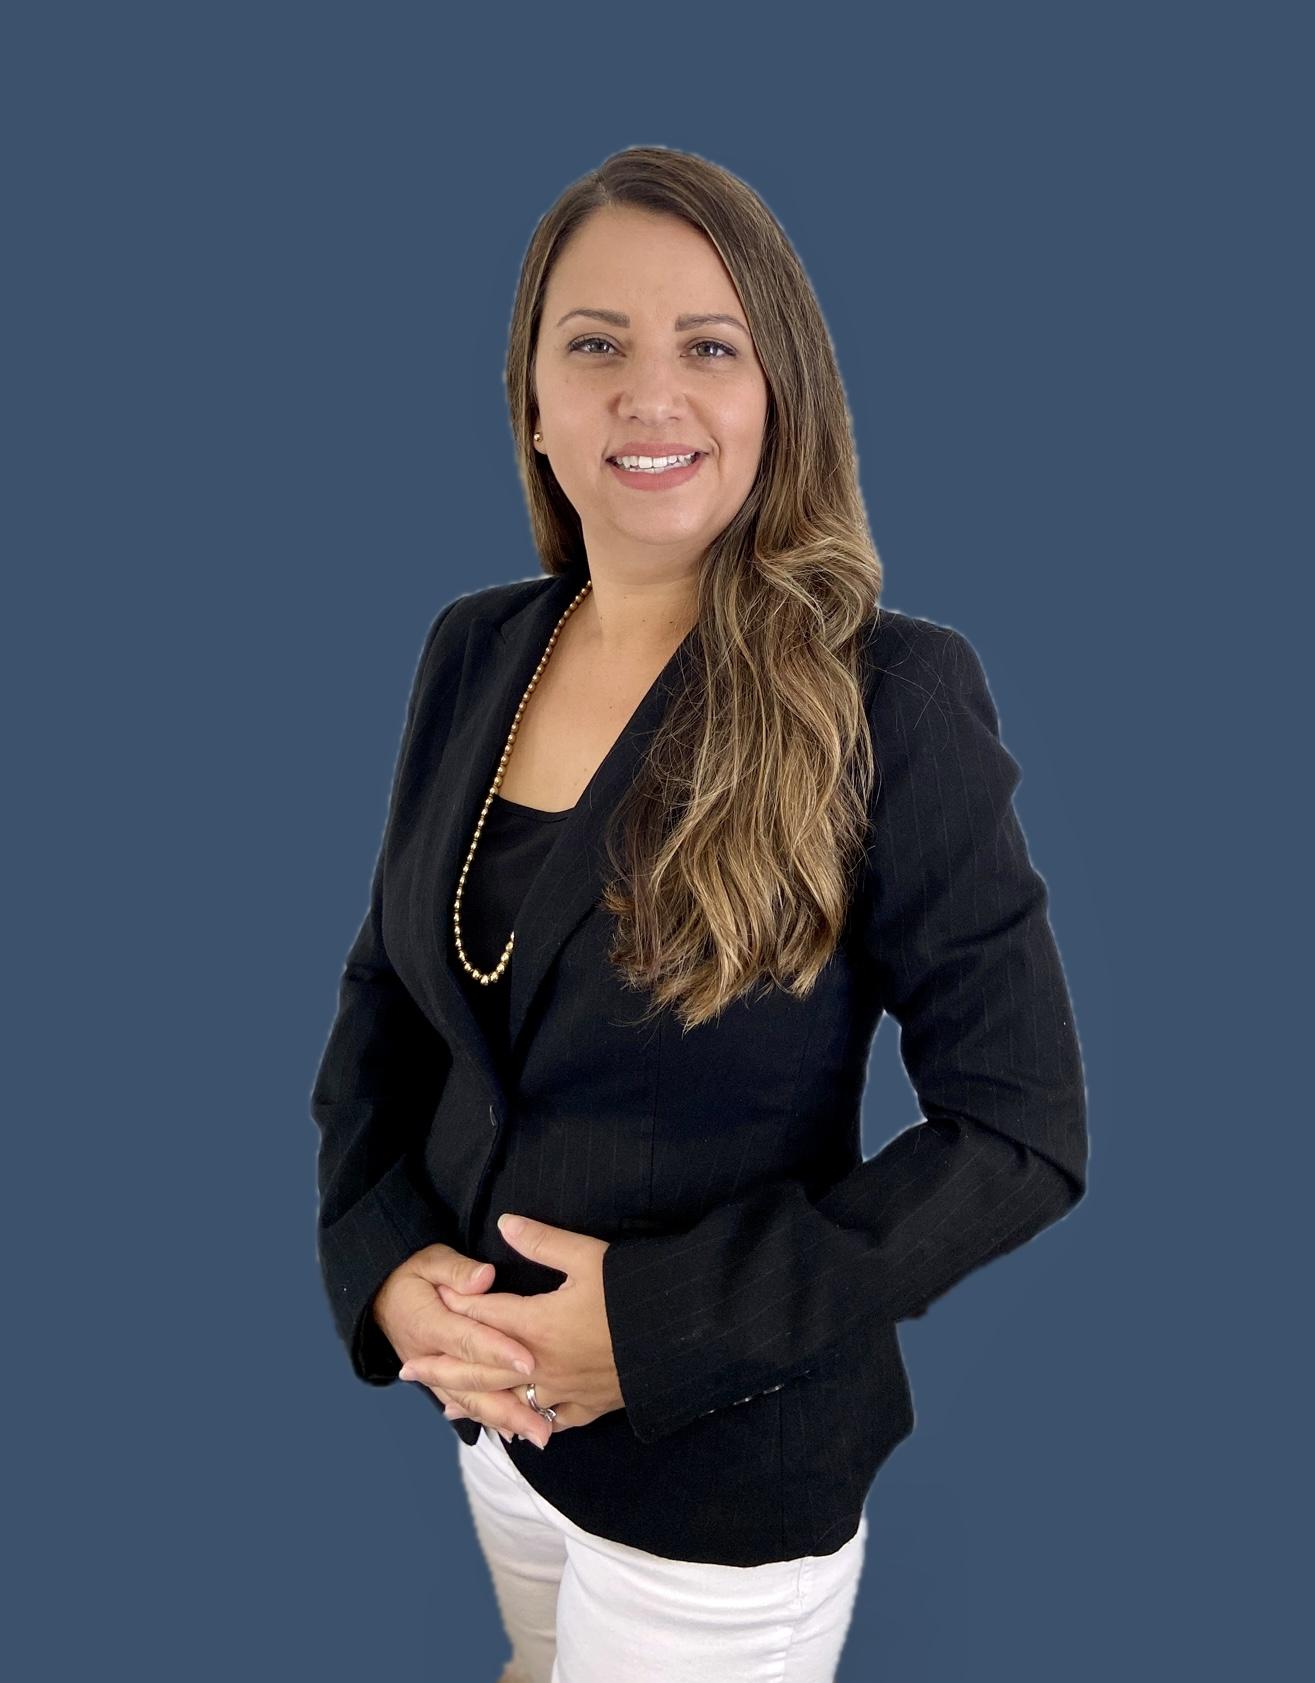 Jessica undefined Betancourt